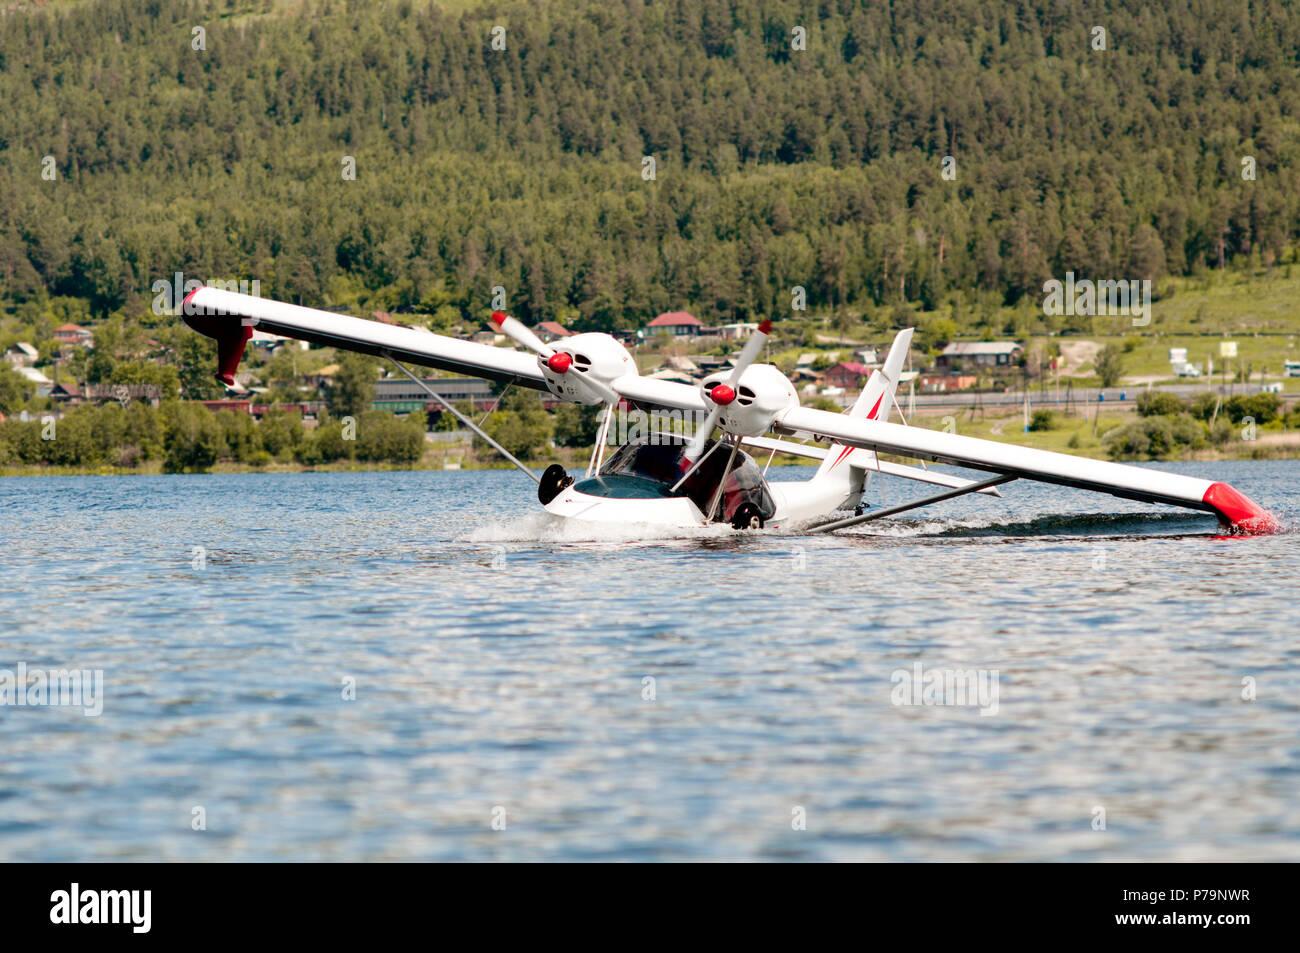 white twin-engine  light   hydroplane make landing or takeoff on water - Stock Image